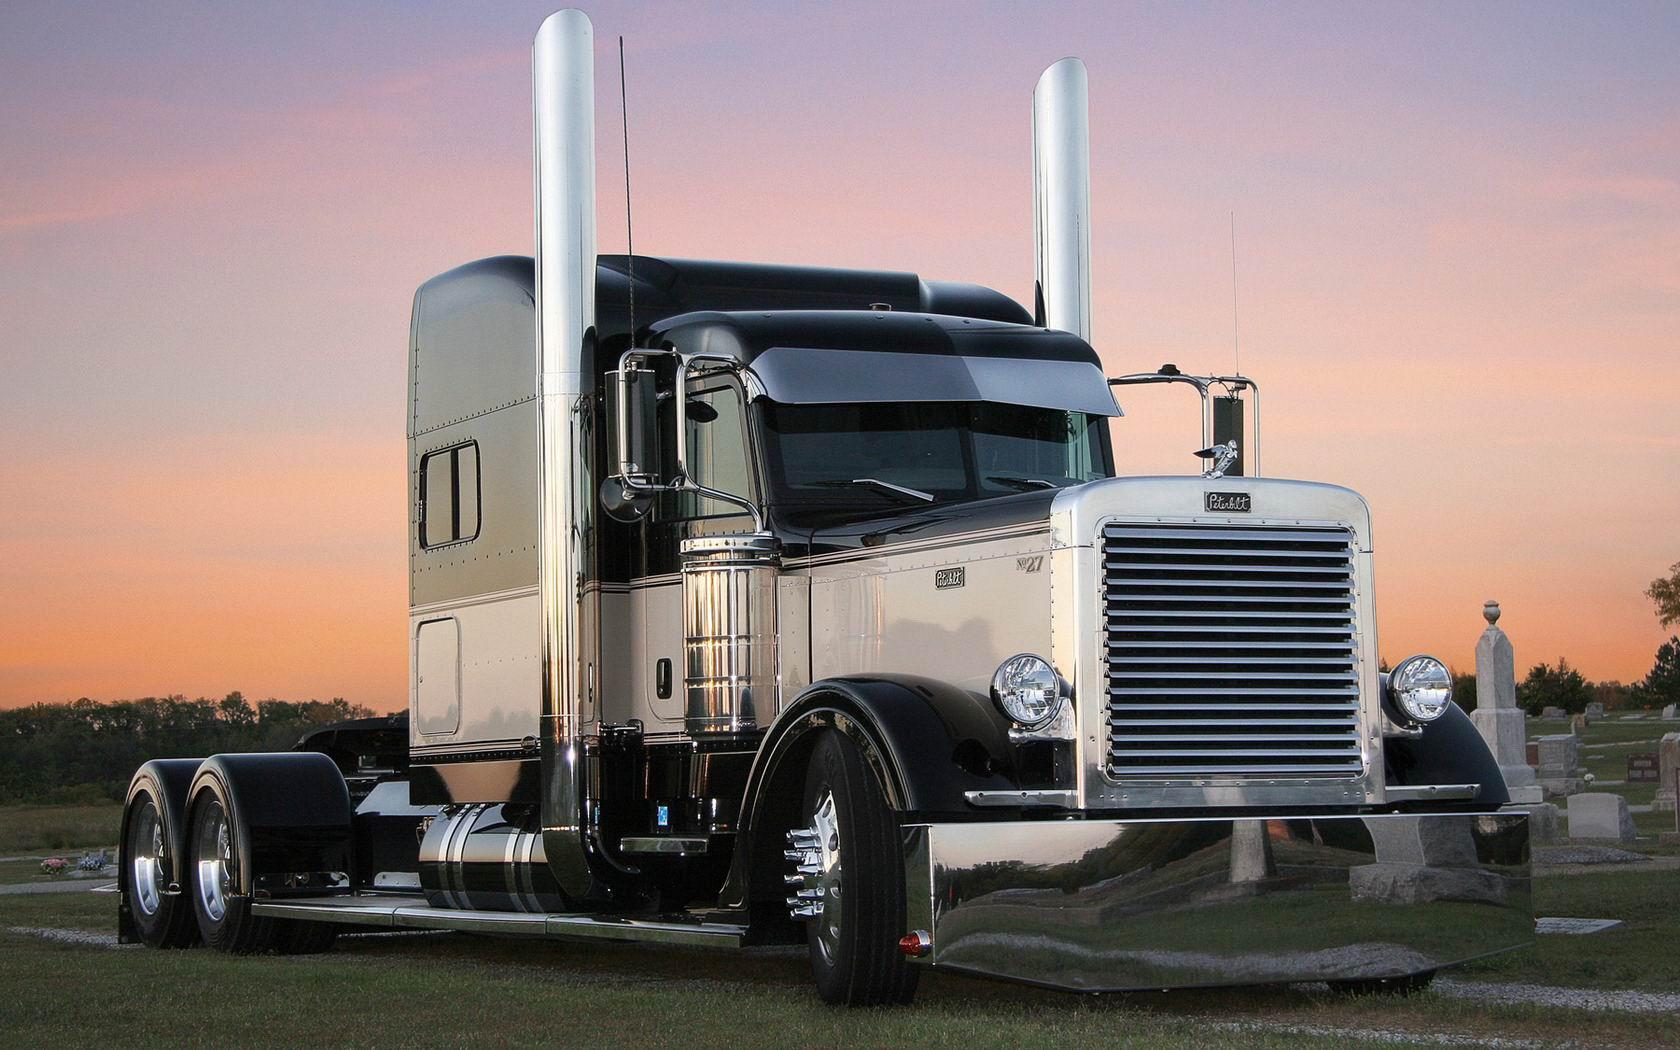 Free Download High quality Trucks Wallpaper Num. 28 : 1680 x 1050 217 ...